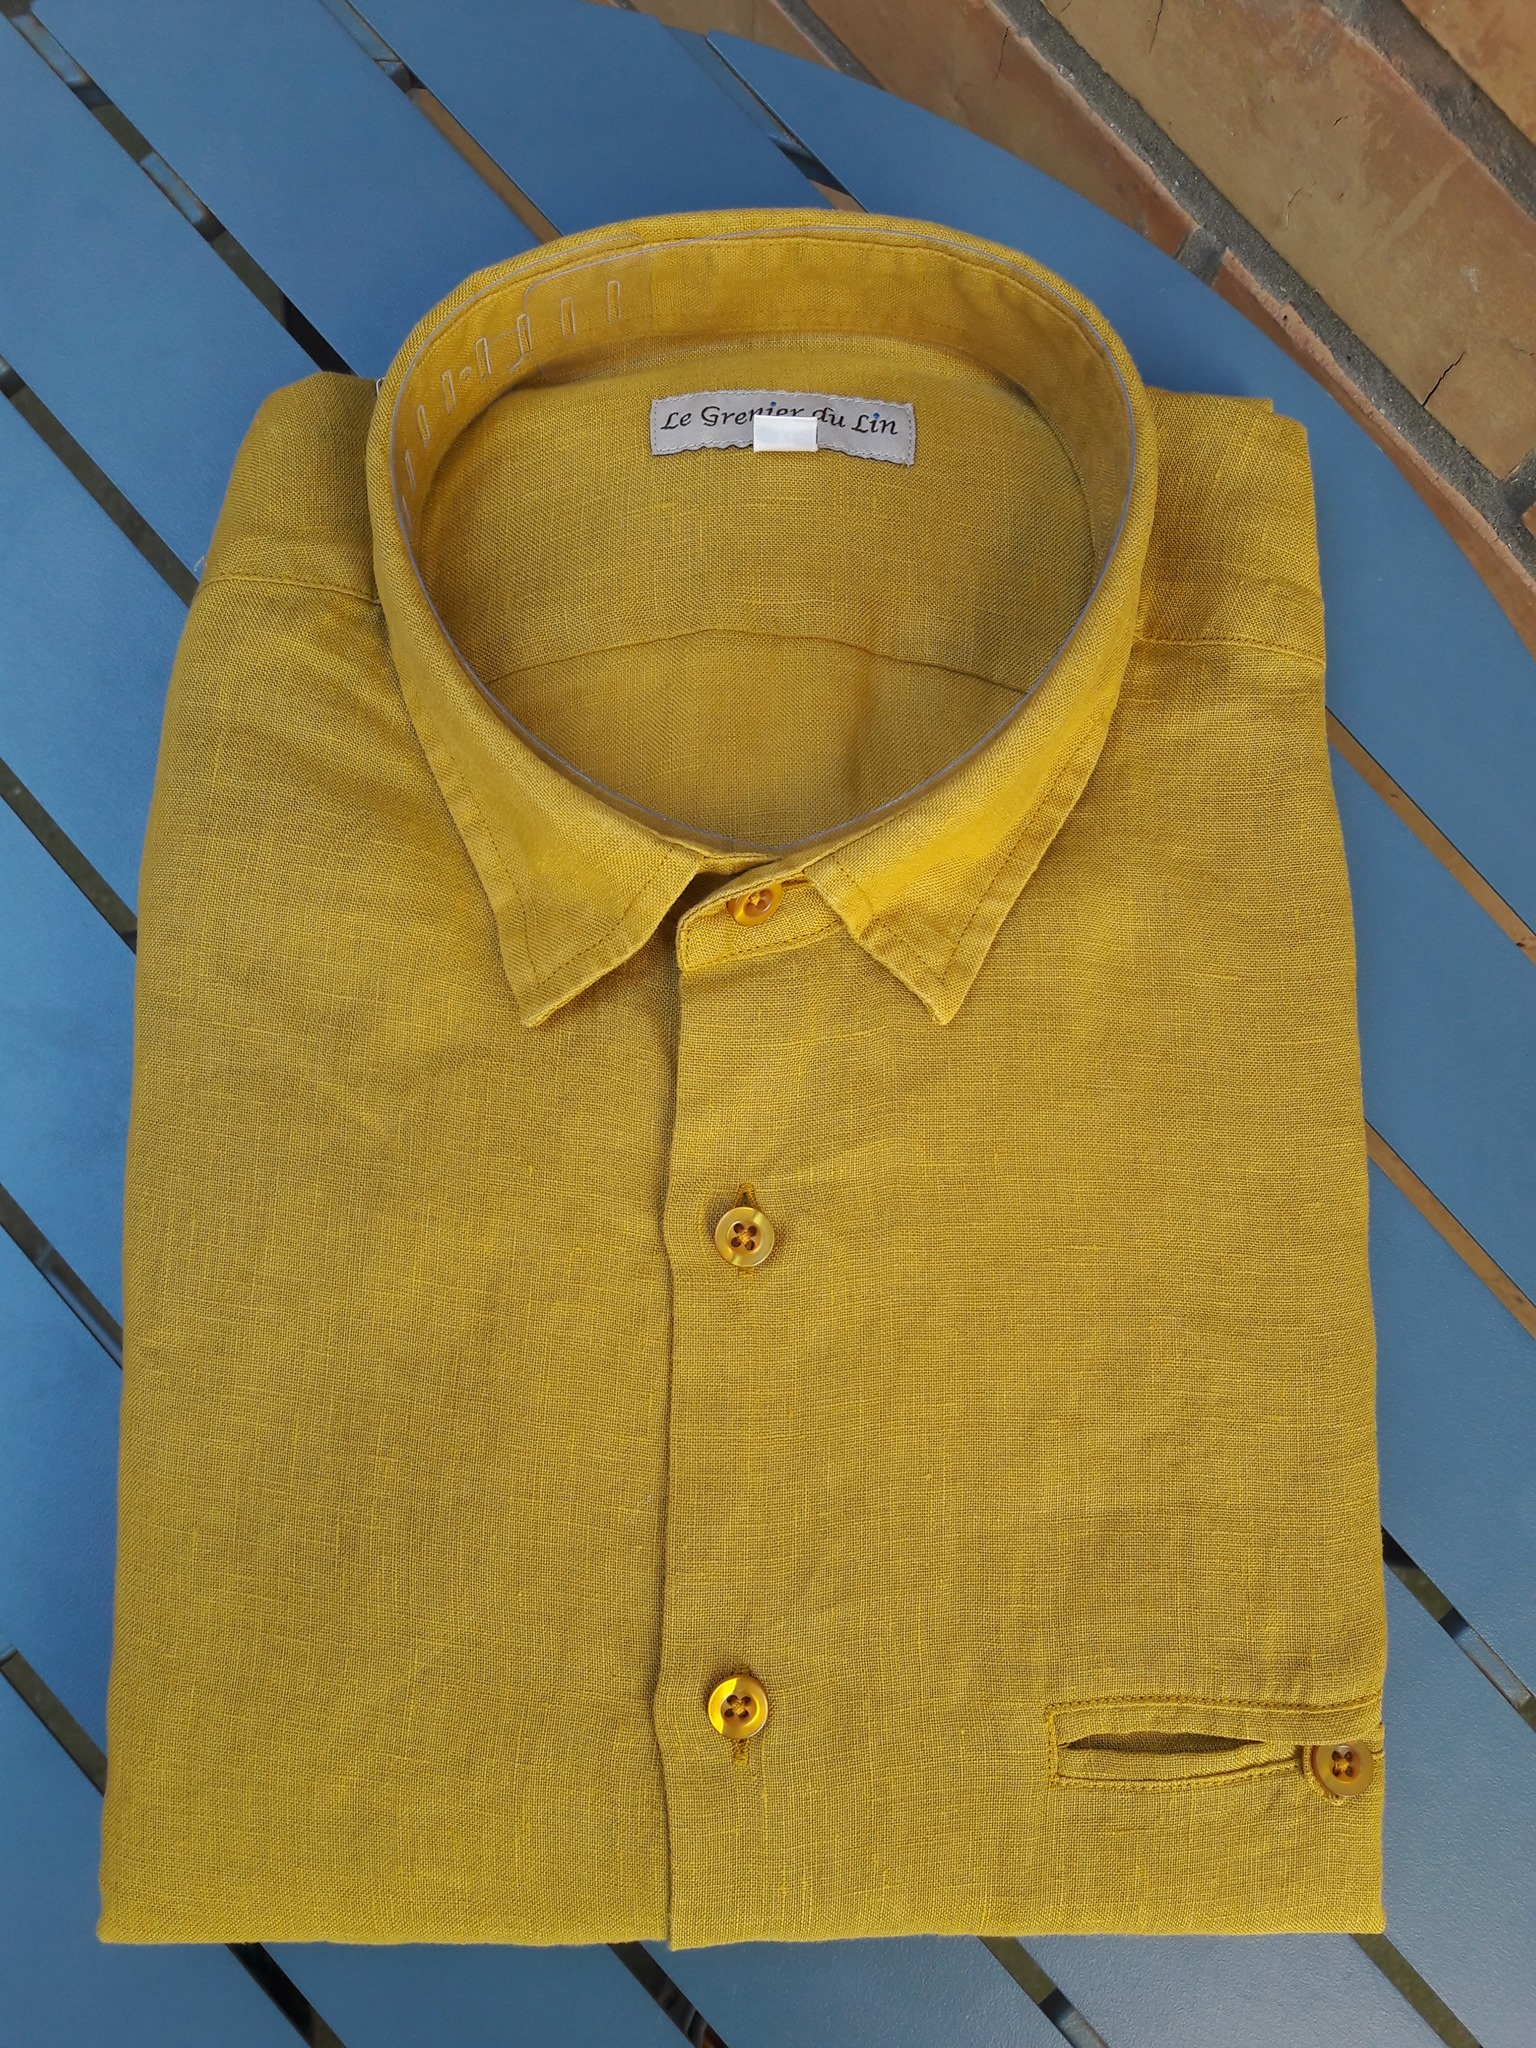 Le grenier du lin Slim-fitted shirt wood saffron yellow